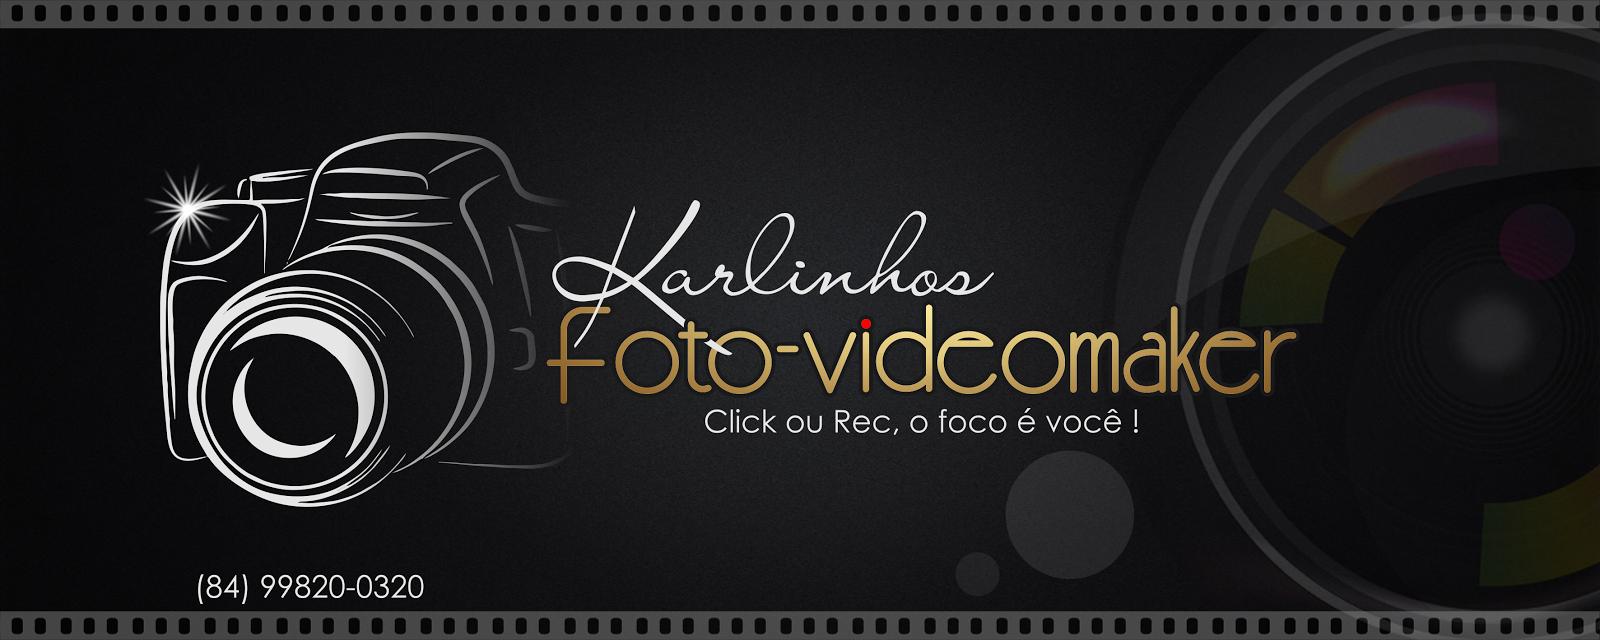 FOTO VIDEOMAKER